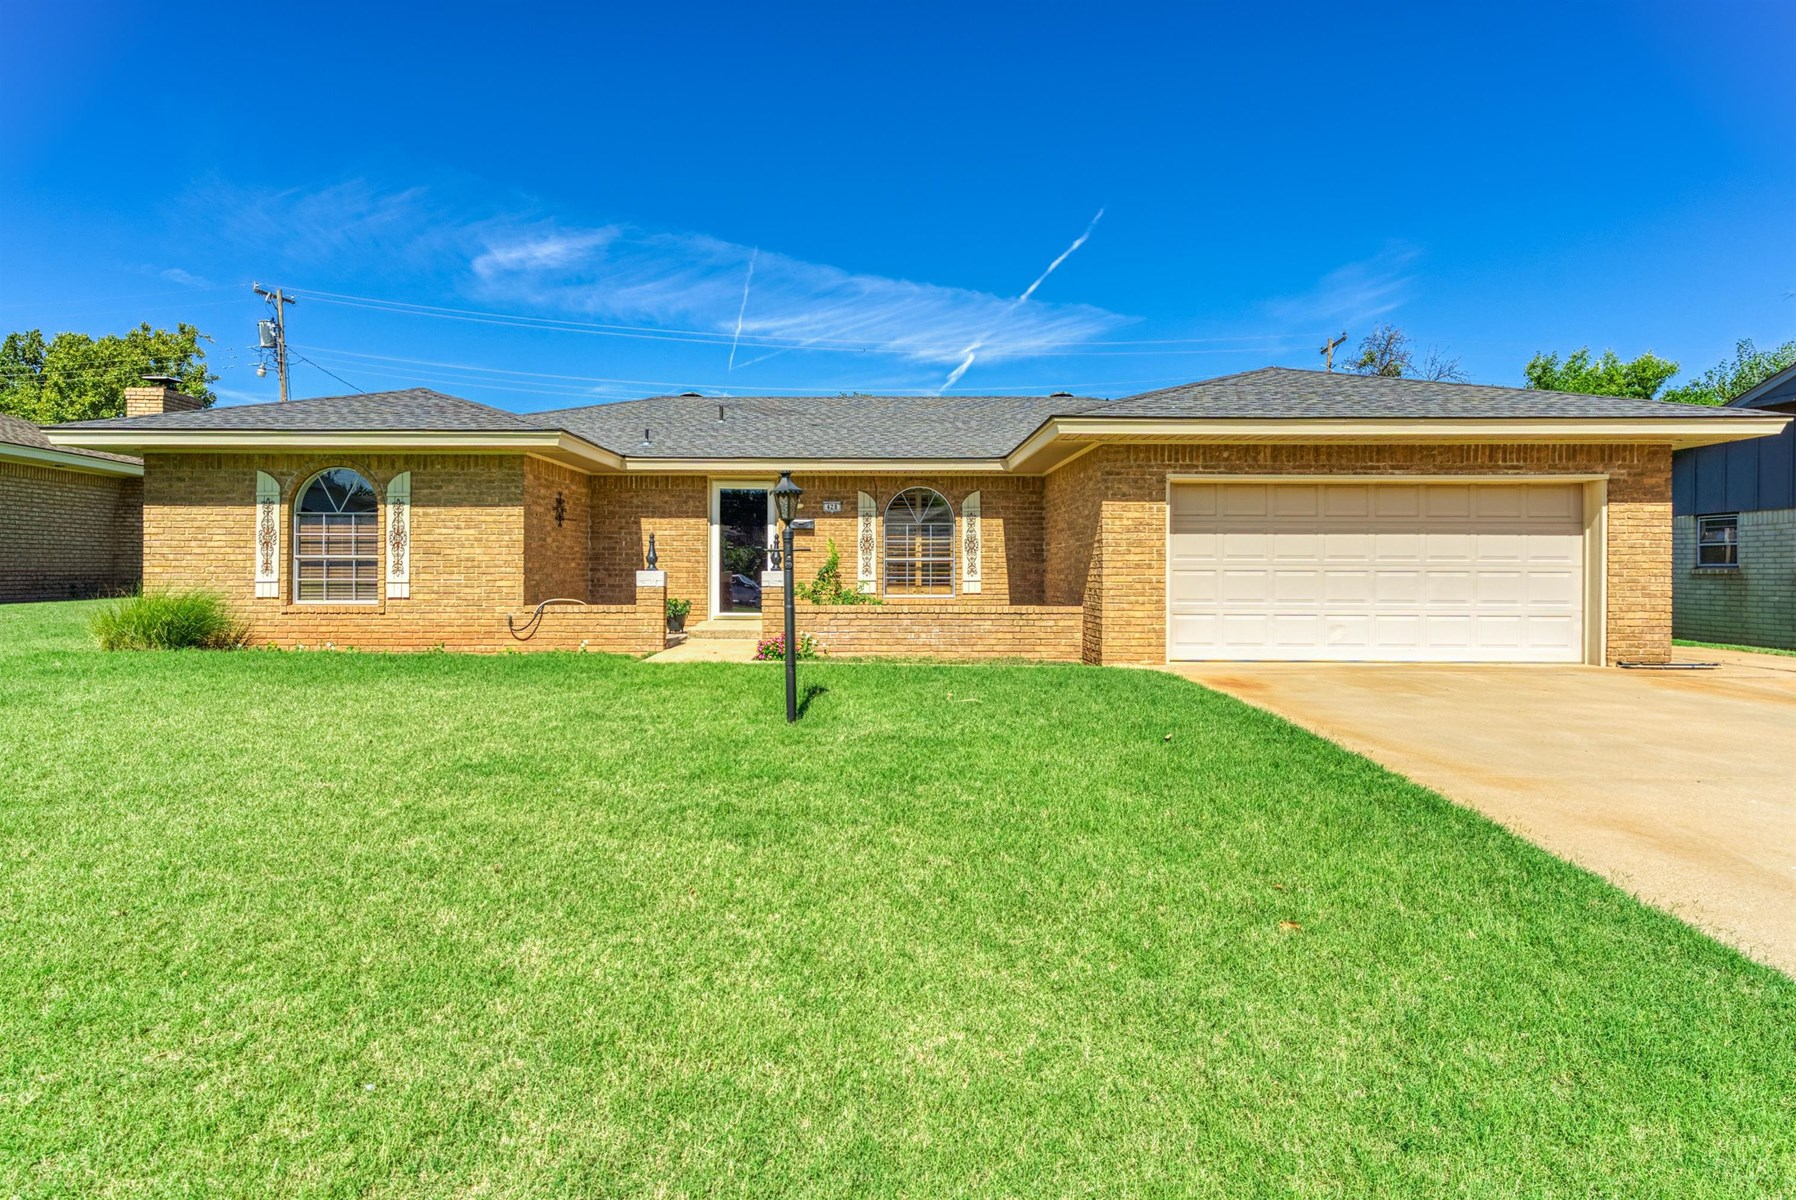 Custer County Home for Sale, Clinton OK